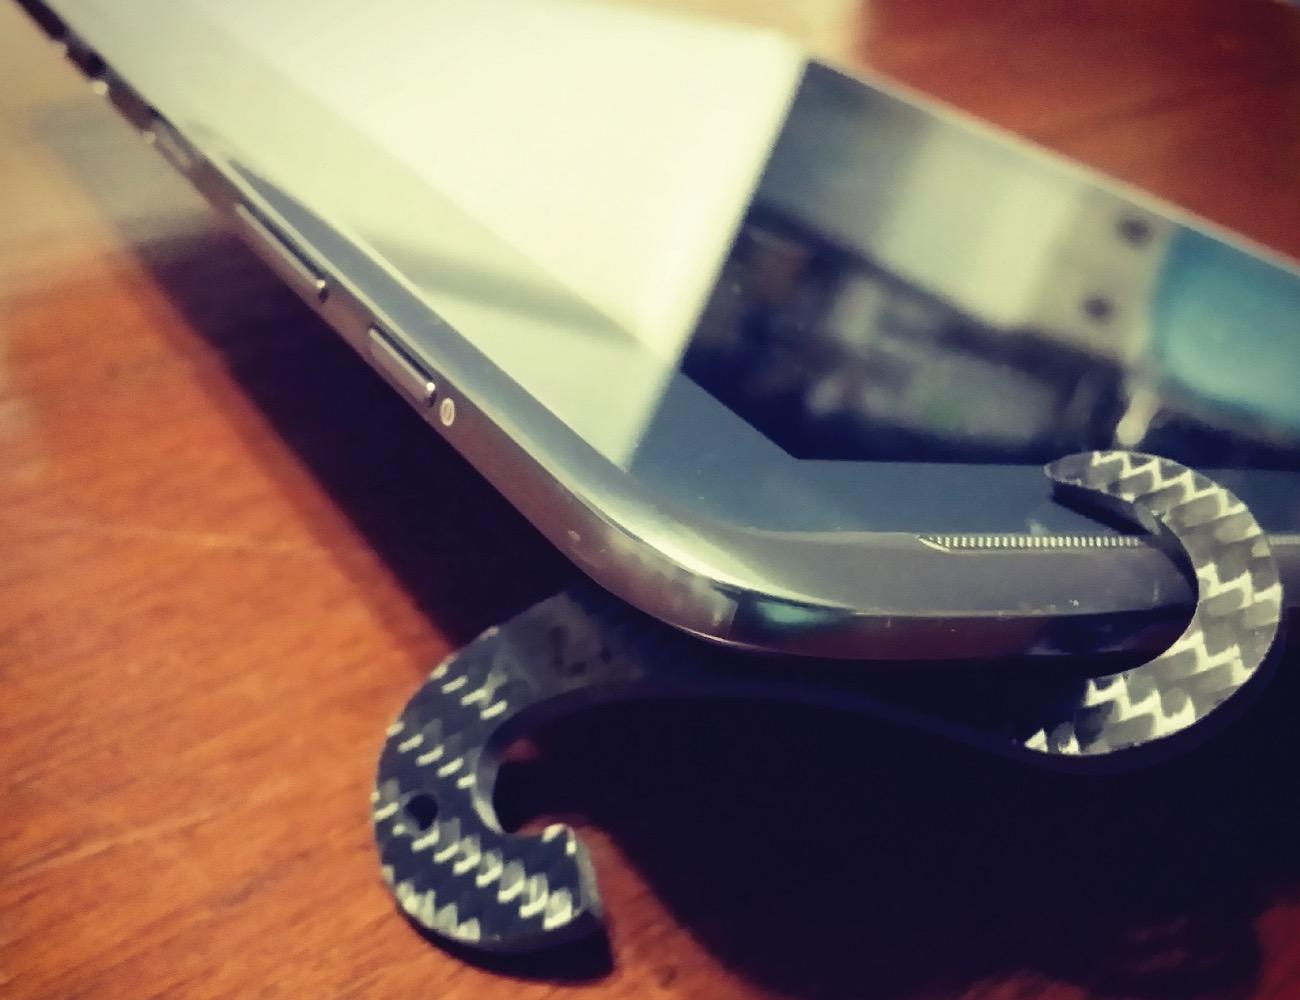 TheMiK – Smartphone Stand – EDC Bottle Opener